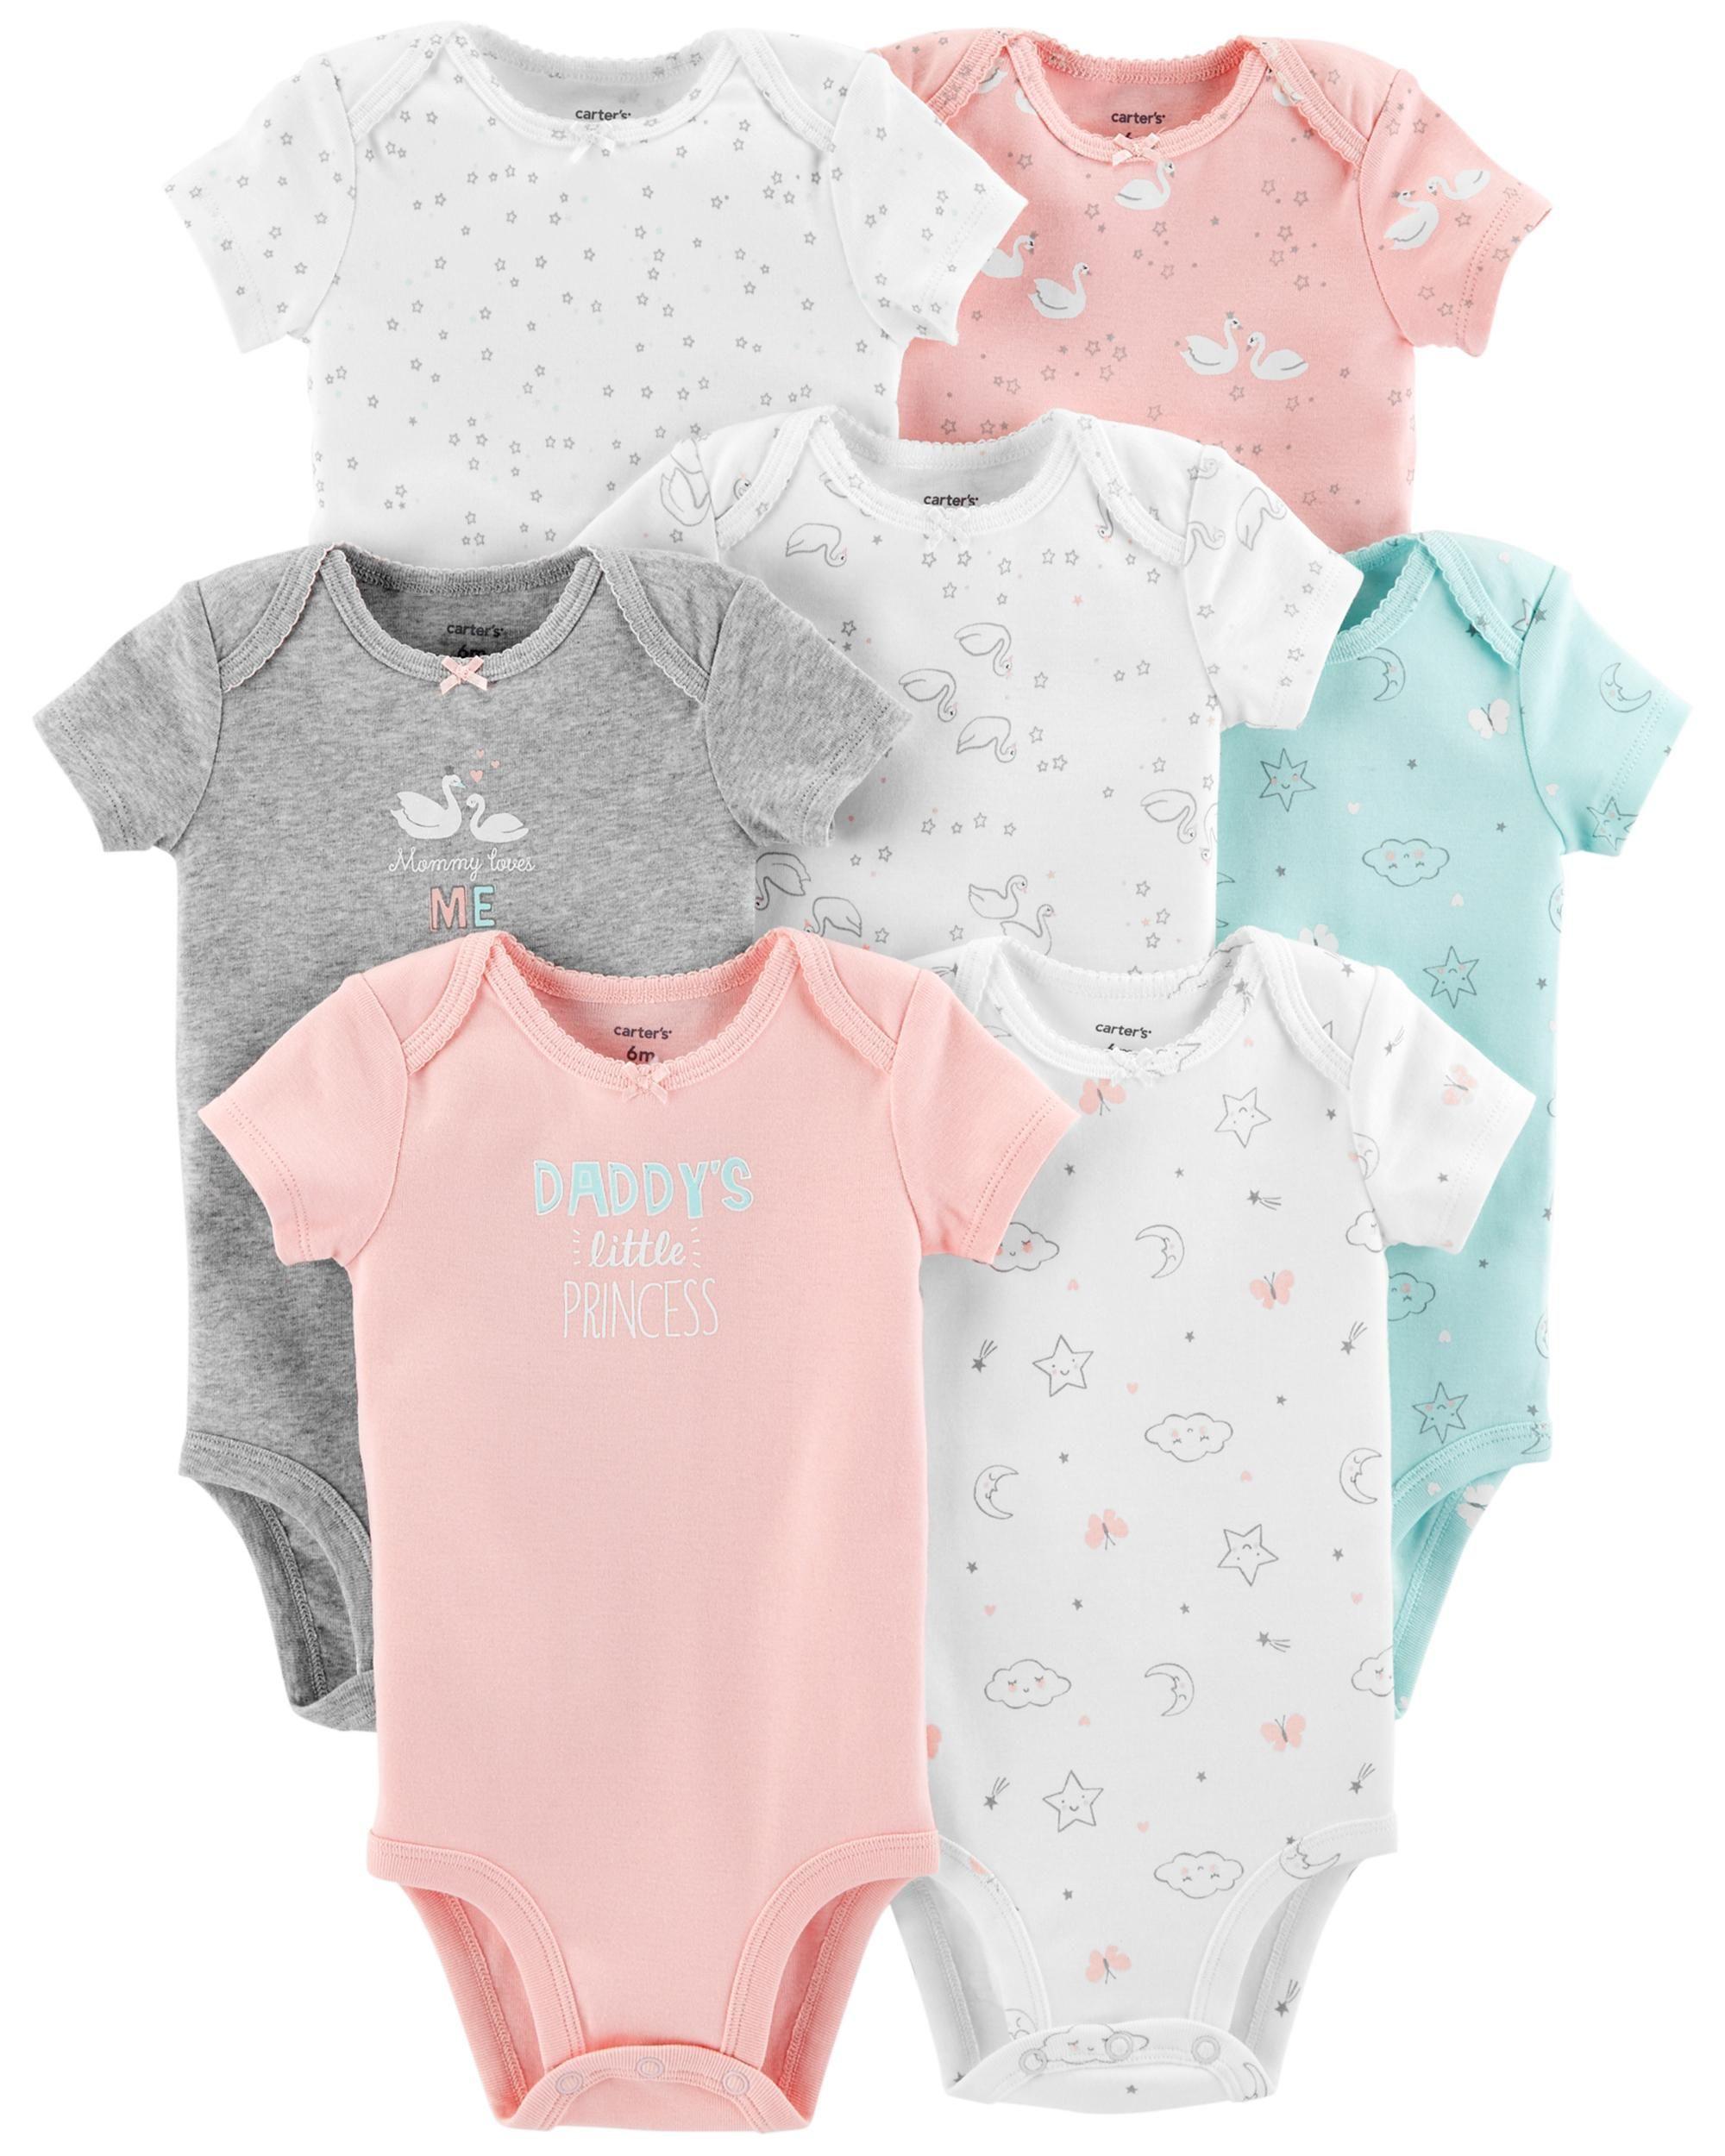 ba1d85b78 7-Pack Short-Sleeve Original Bodysuits | Baby checklist | Carters ...